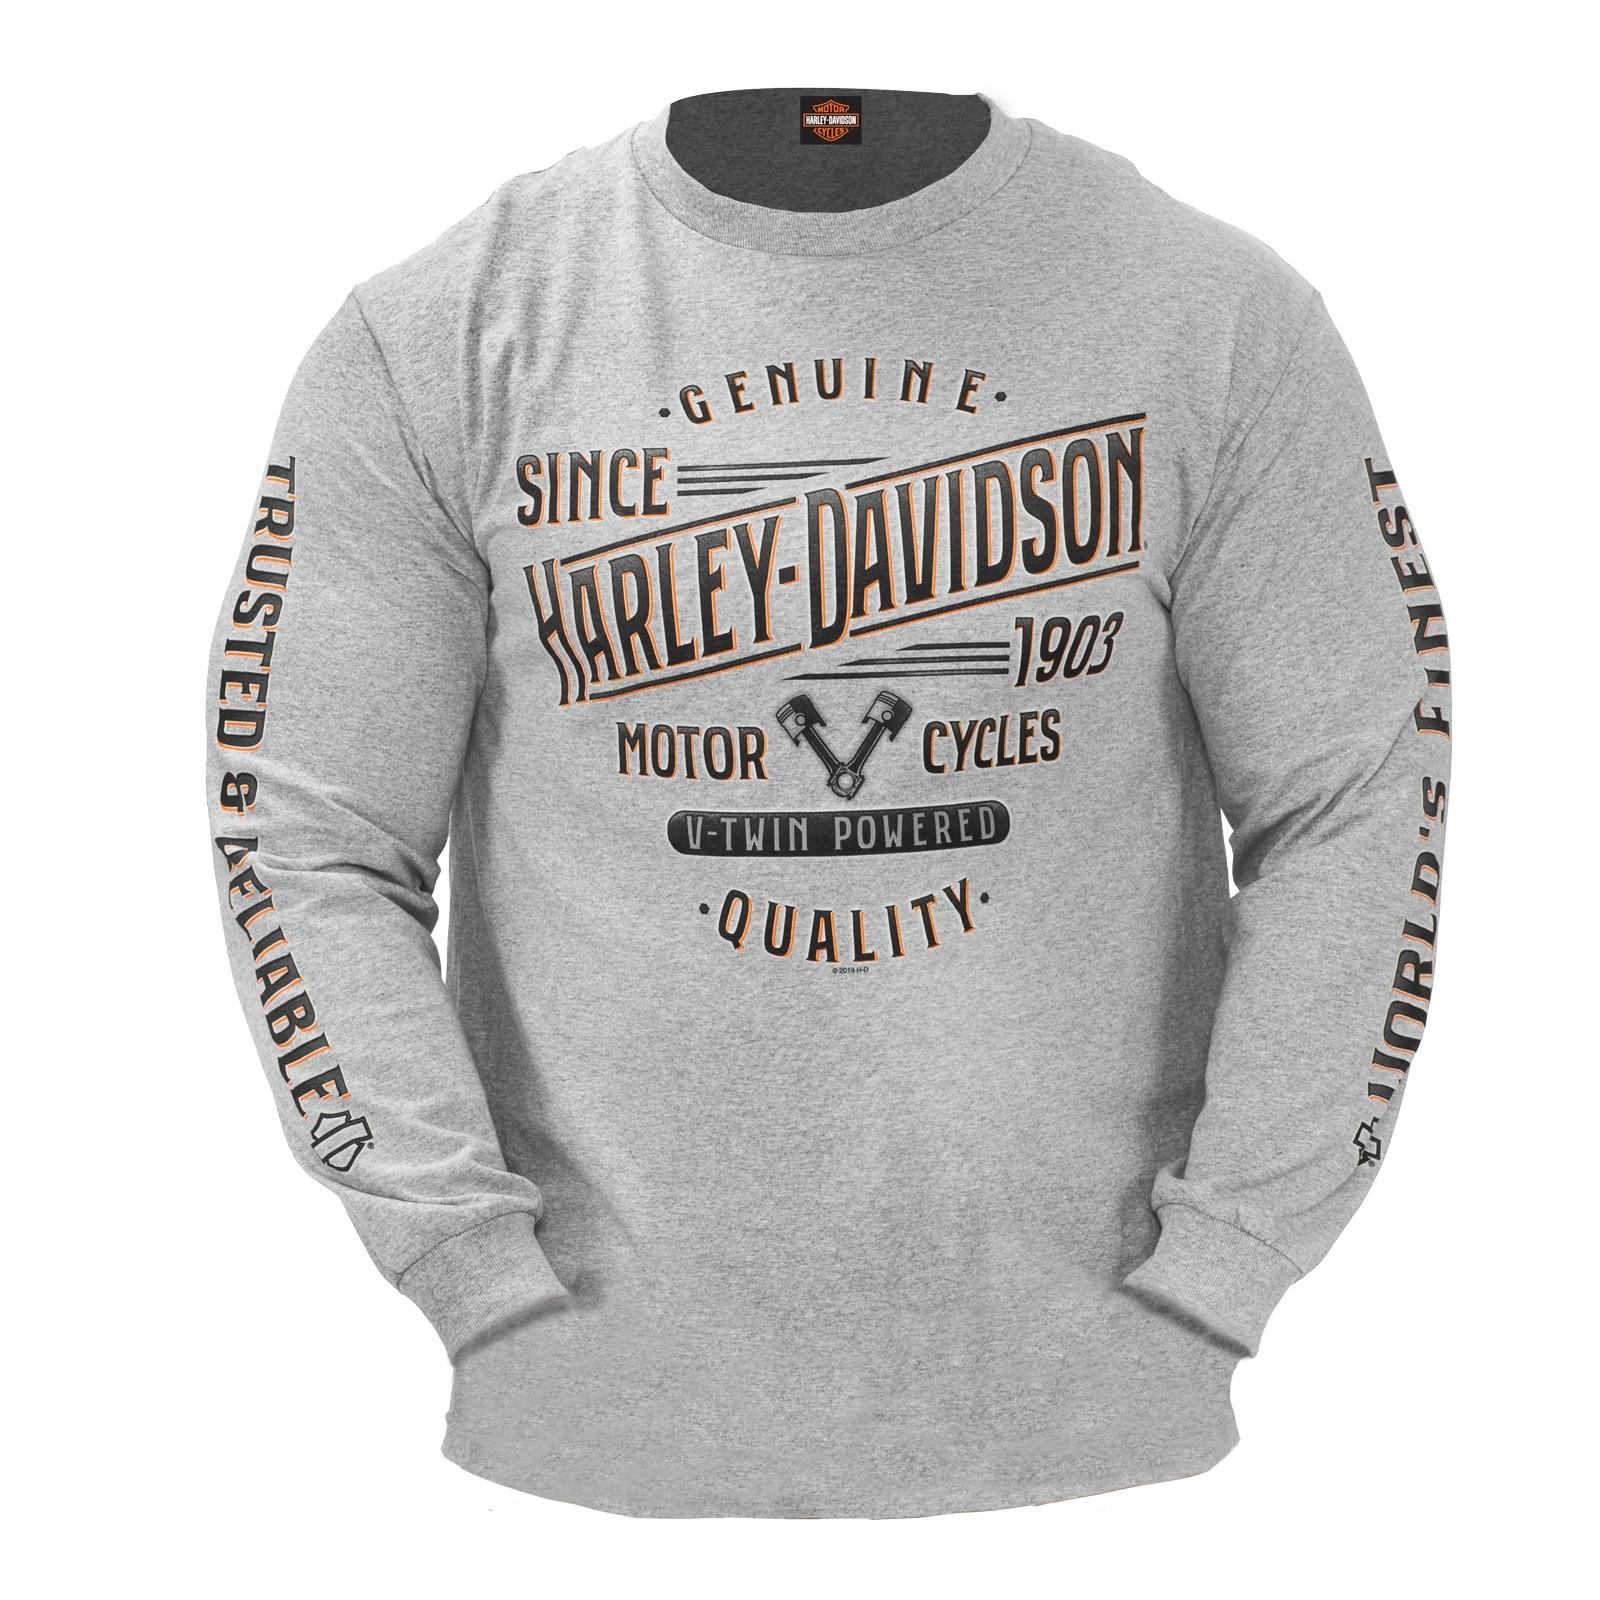 Harley-Davidson Military - Men's Athletic Heather Long-Sleeve Graphic T-Shirt - NSA Naples | Summit